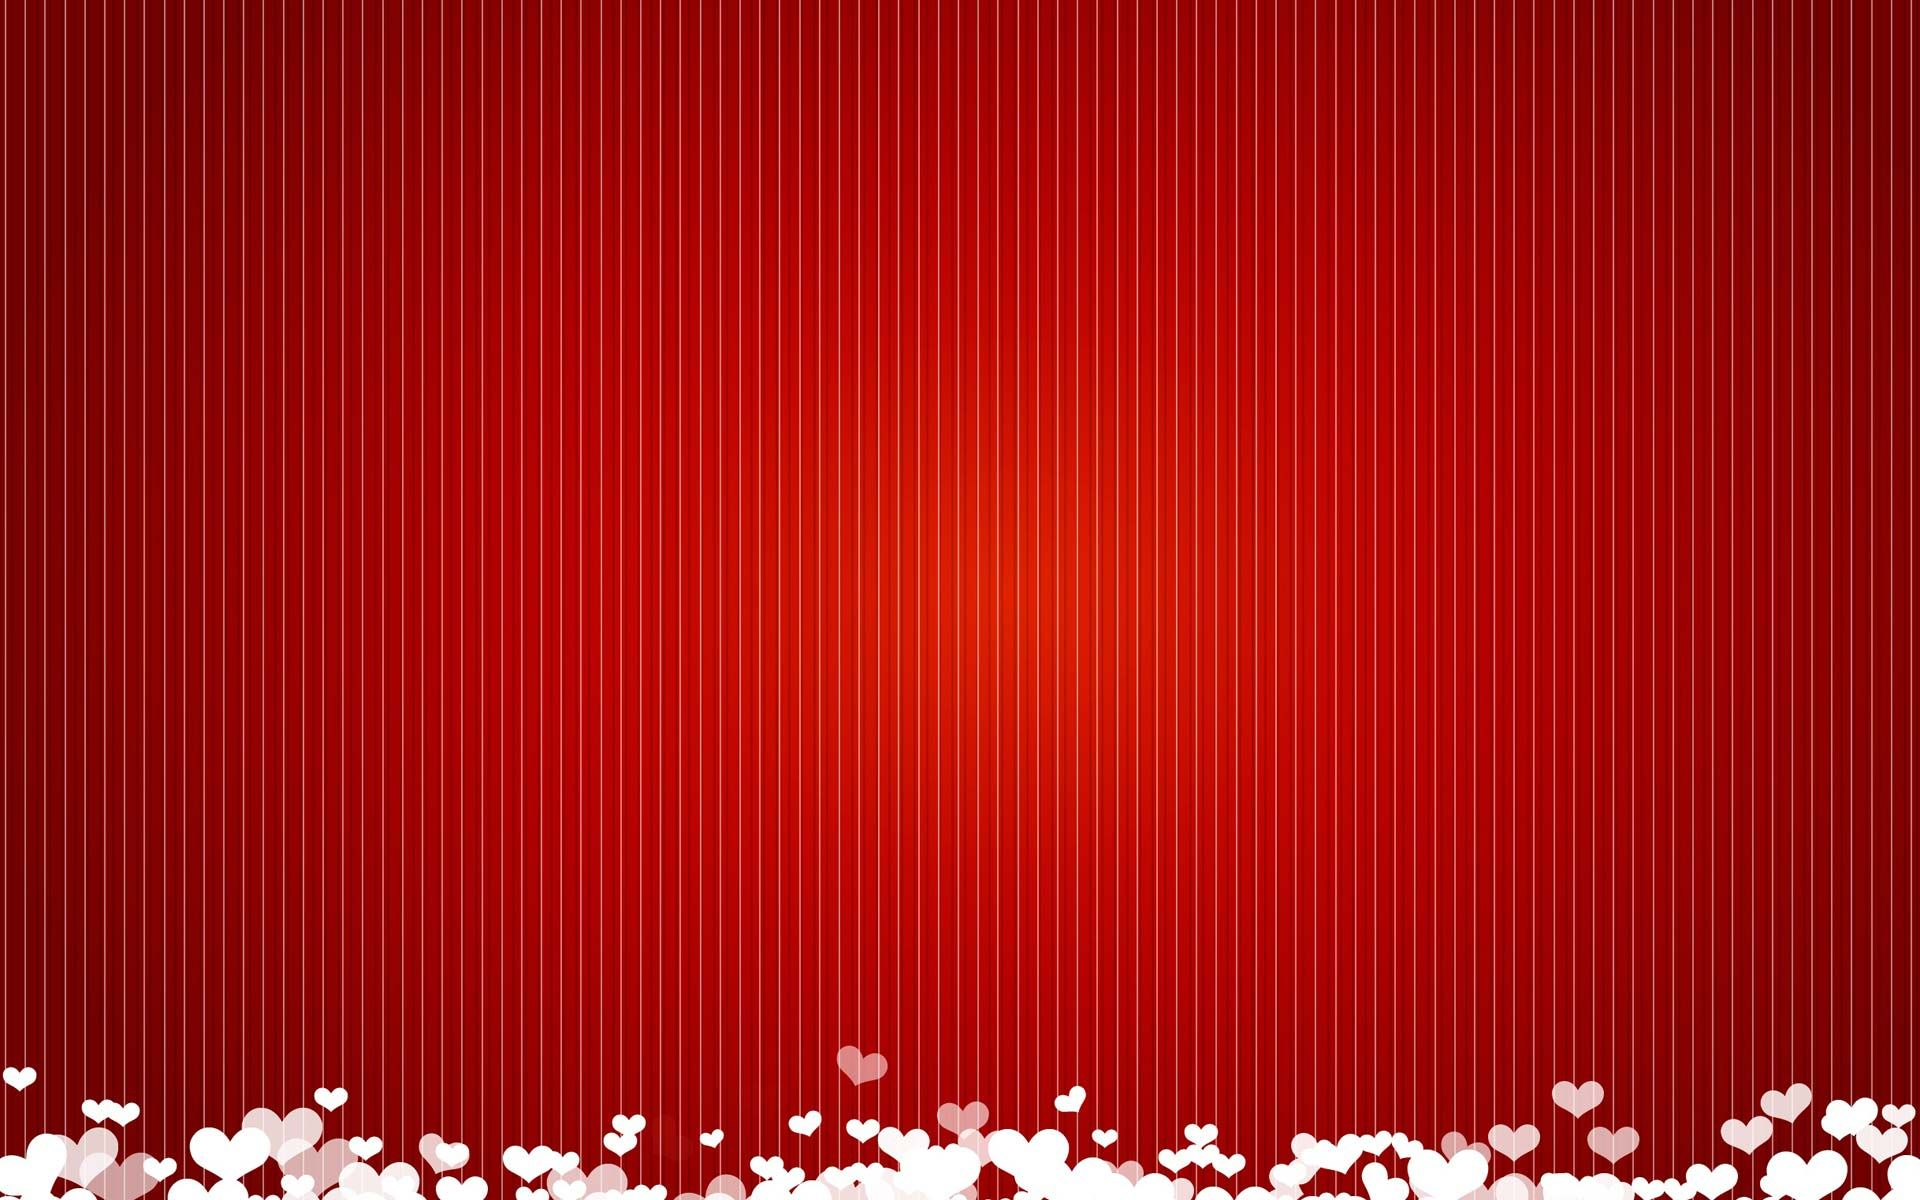 Im genes del d a san valent n para fondo celular en hd 11 - San valentin desktop backgrounds ...